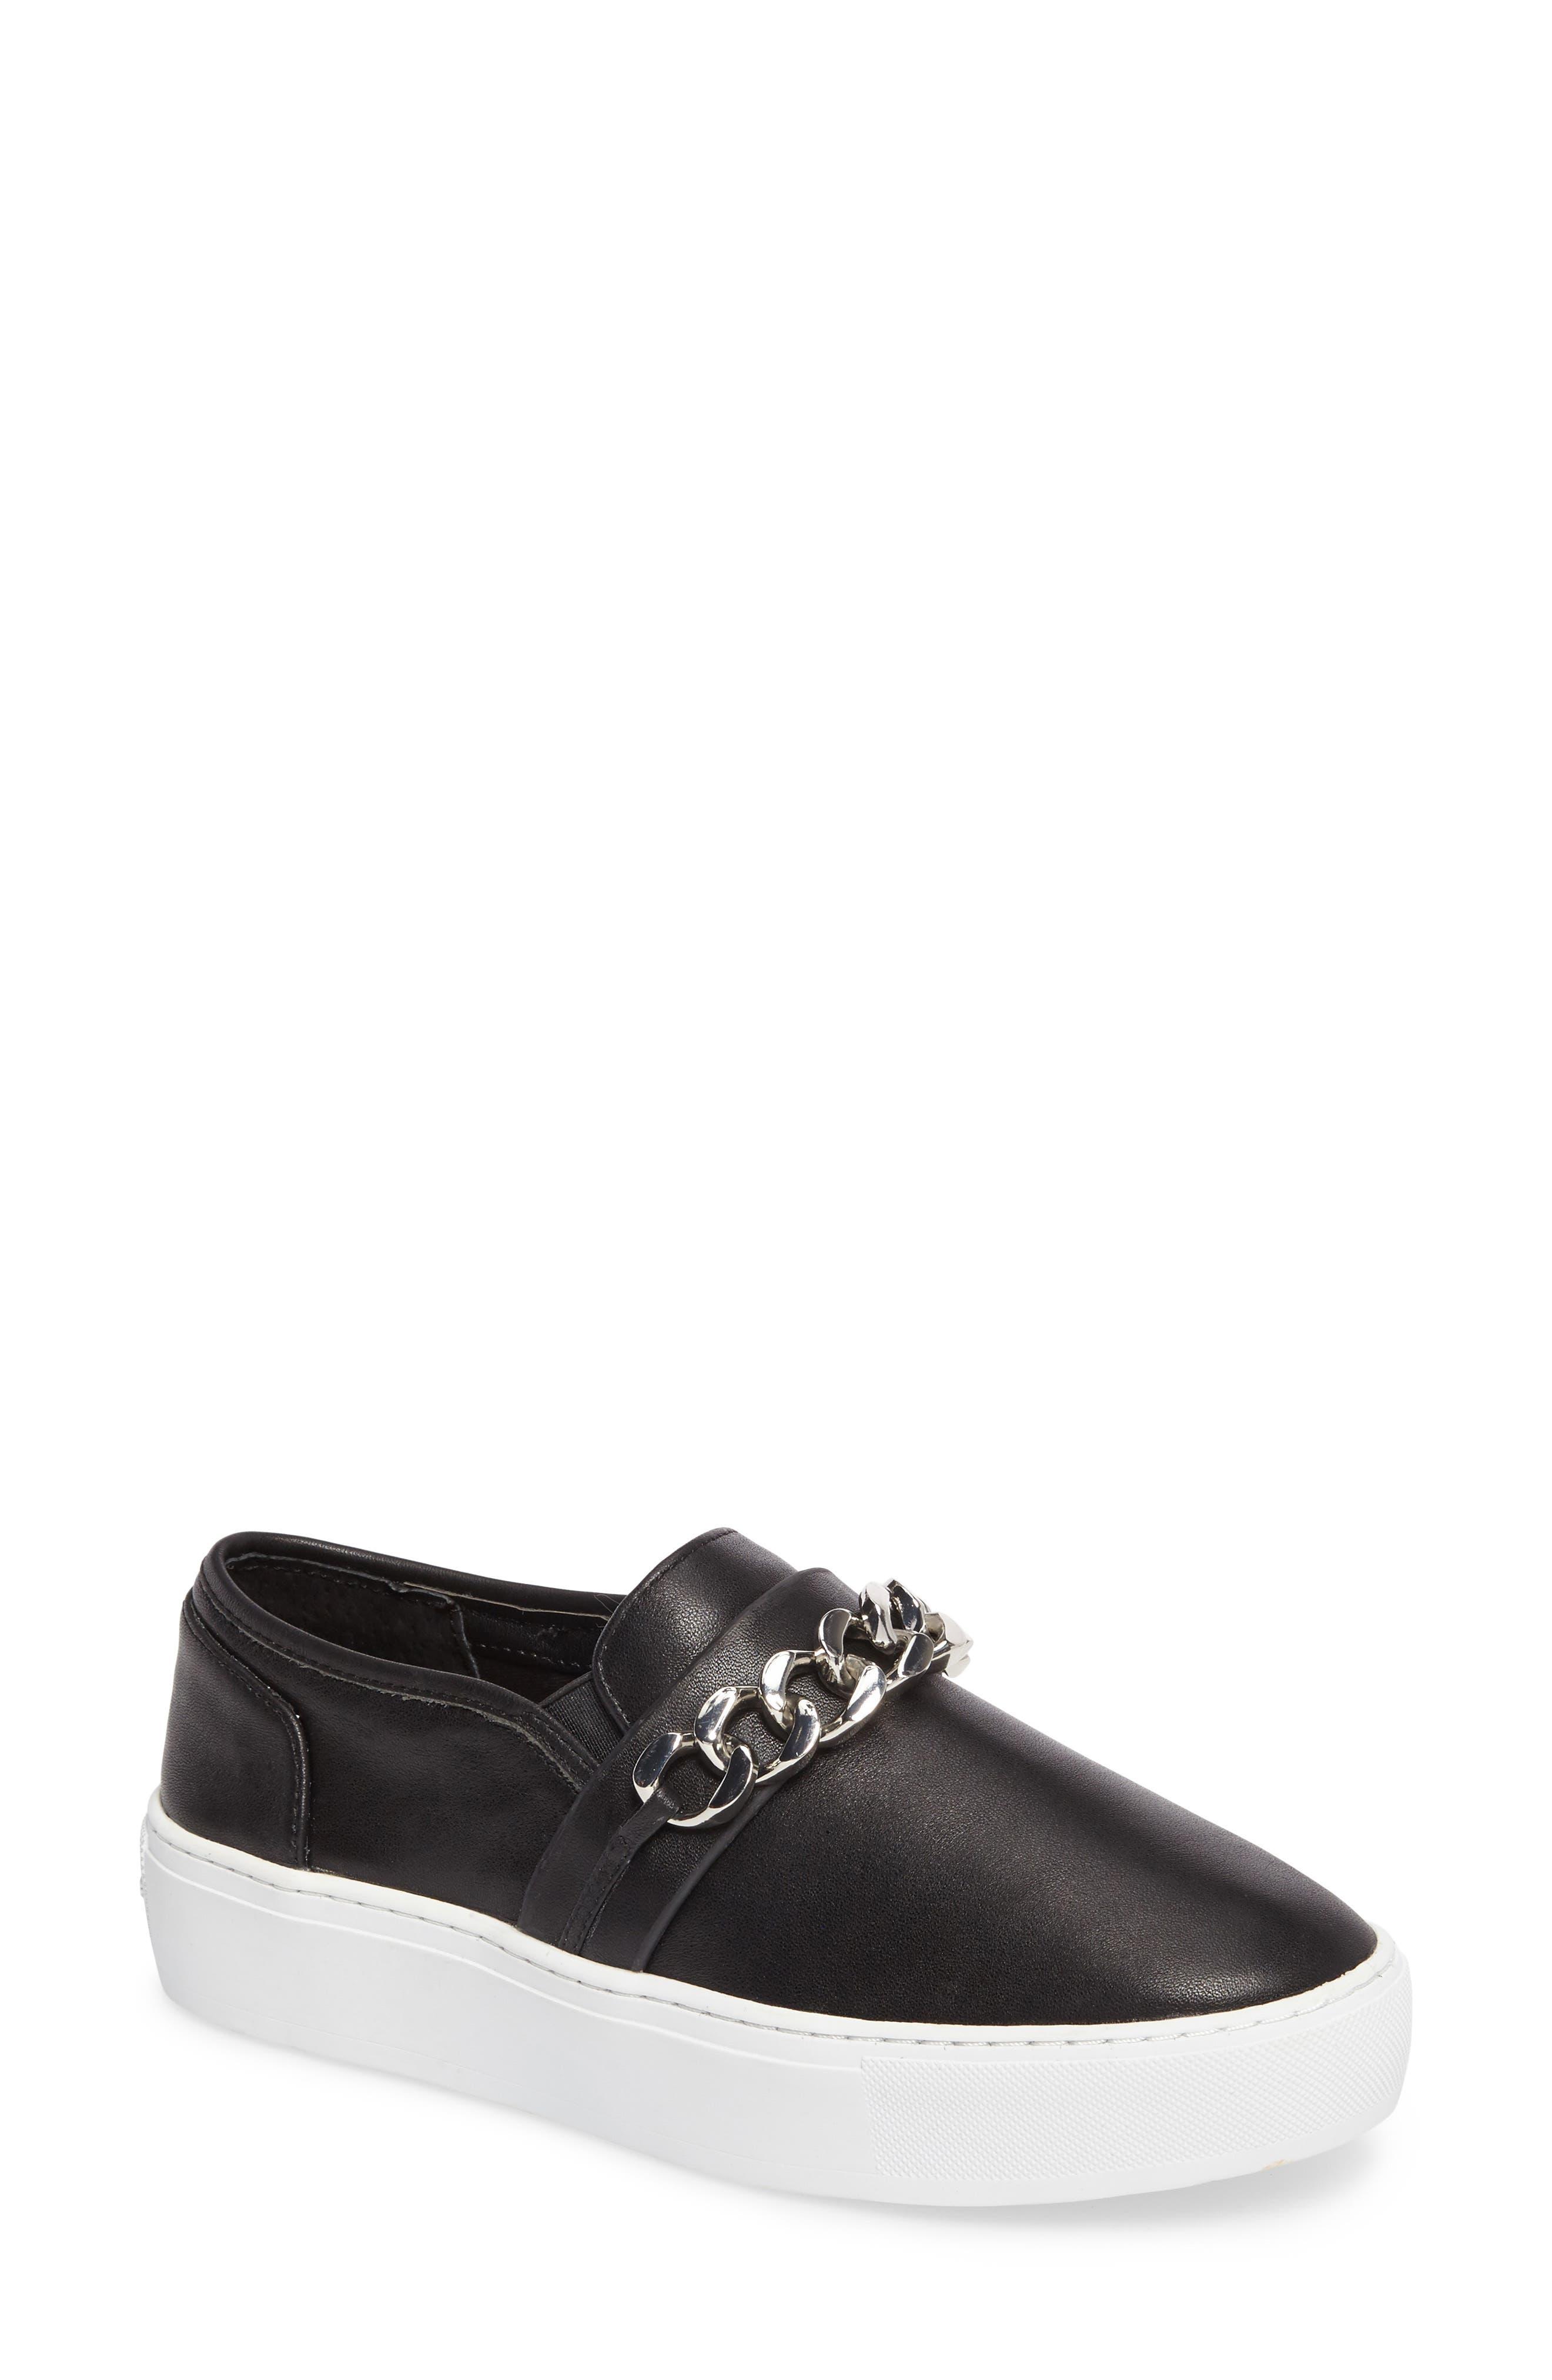 Nala Slip-On Sneaker,                             Main thumbnail 1, color,                             001